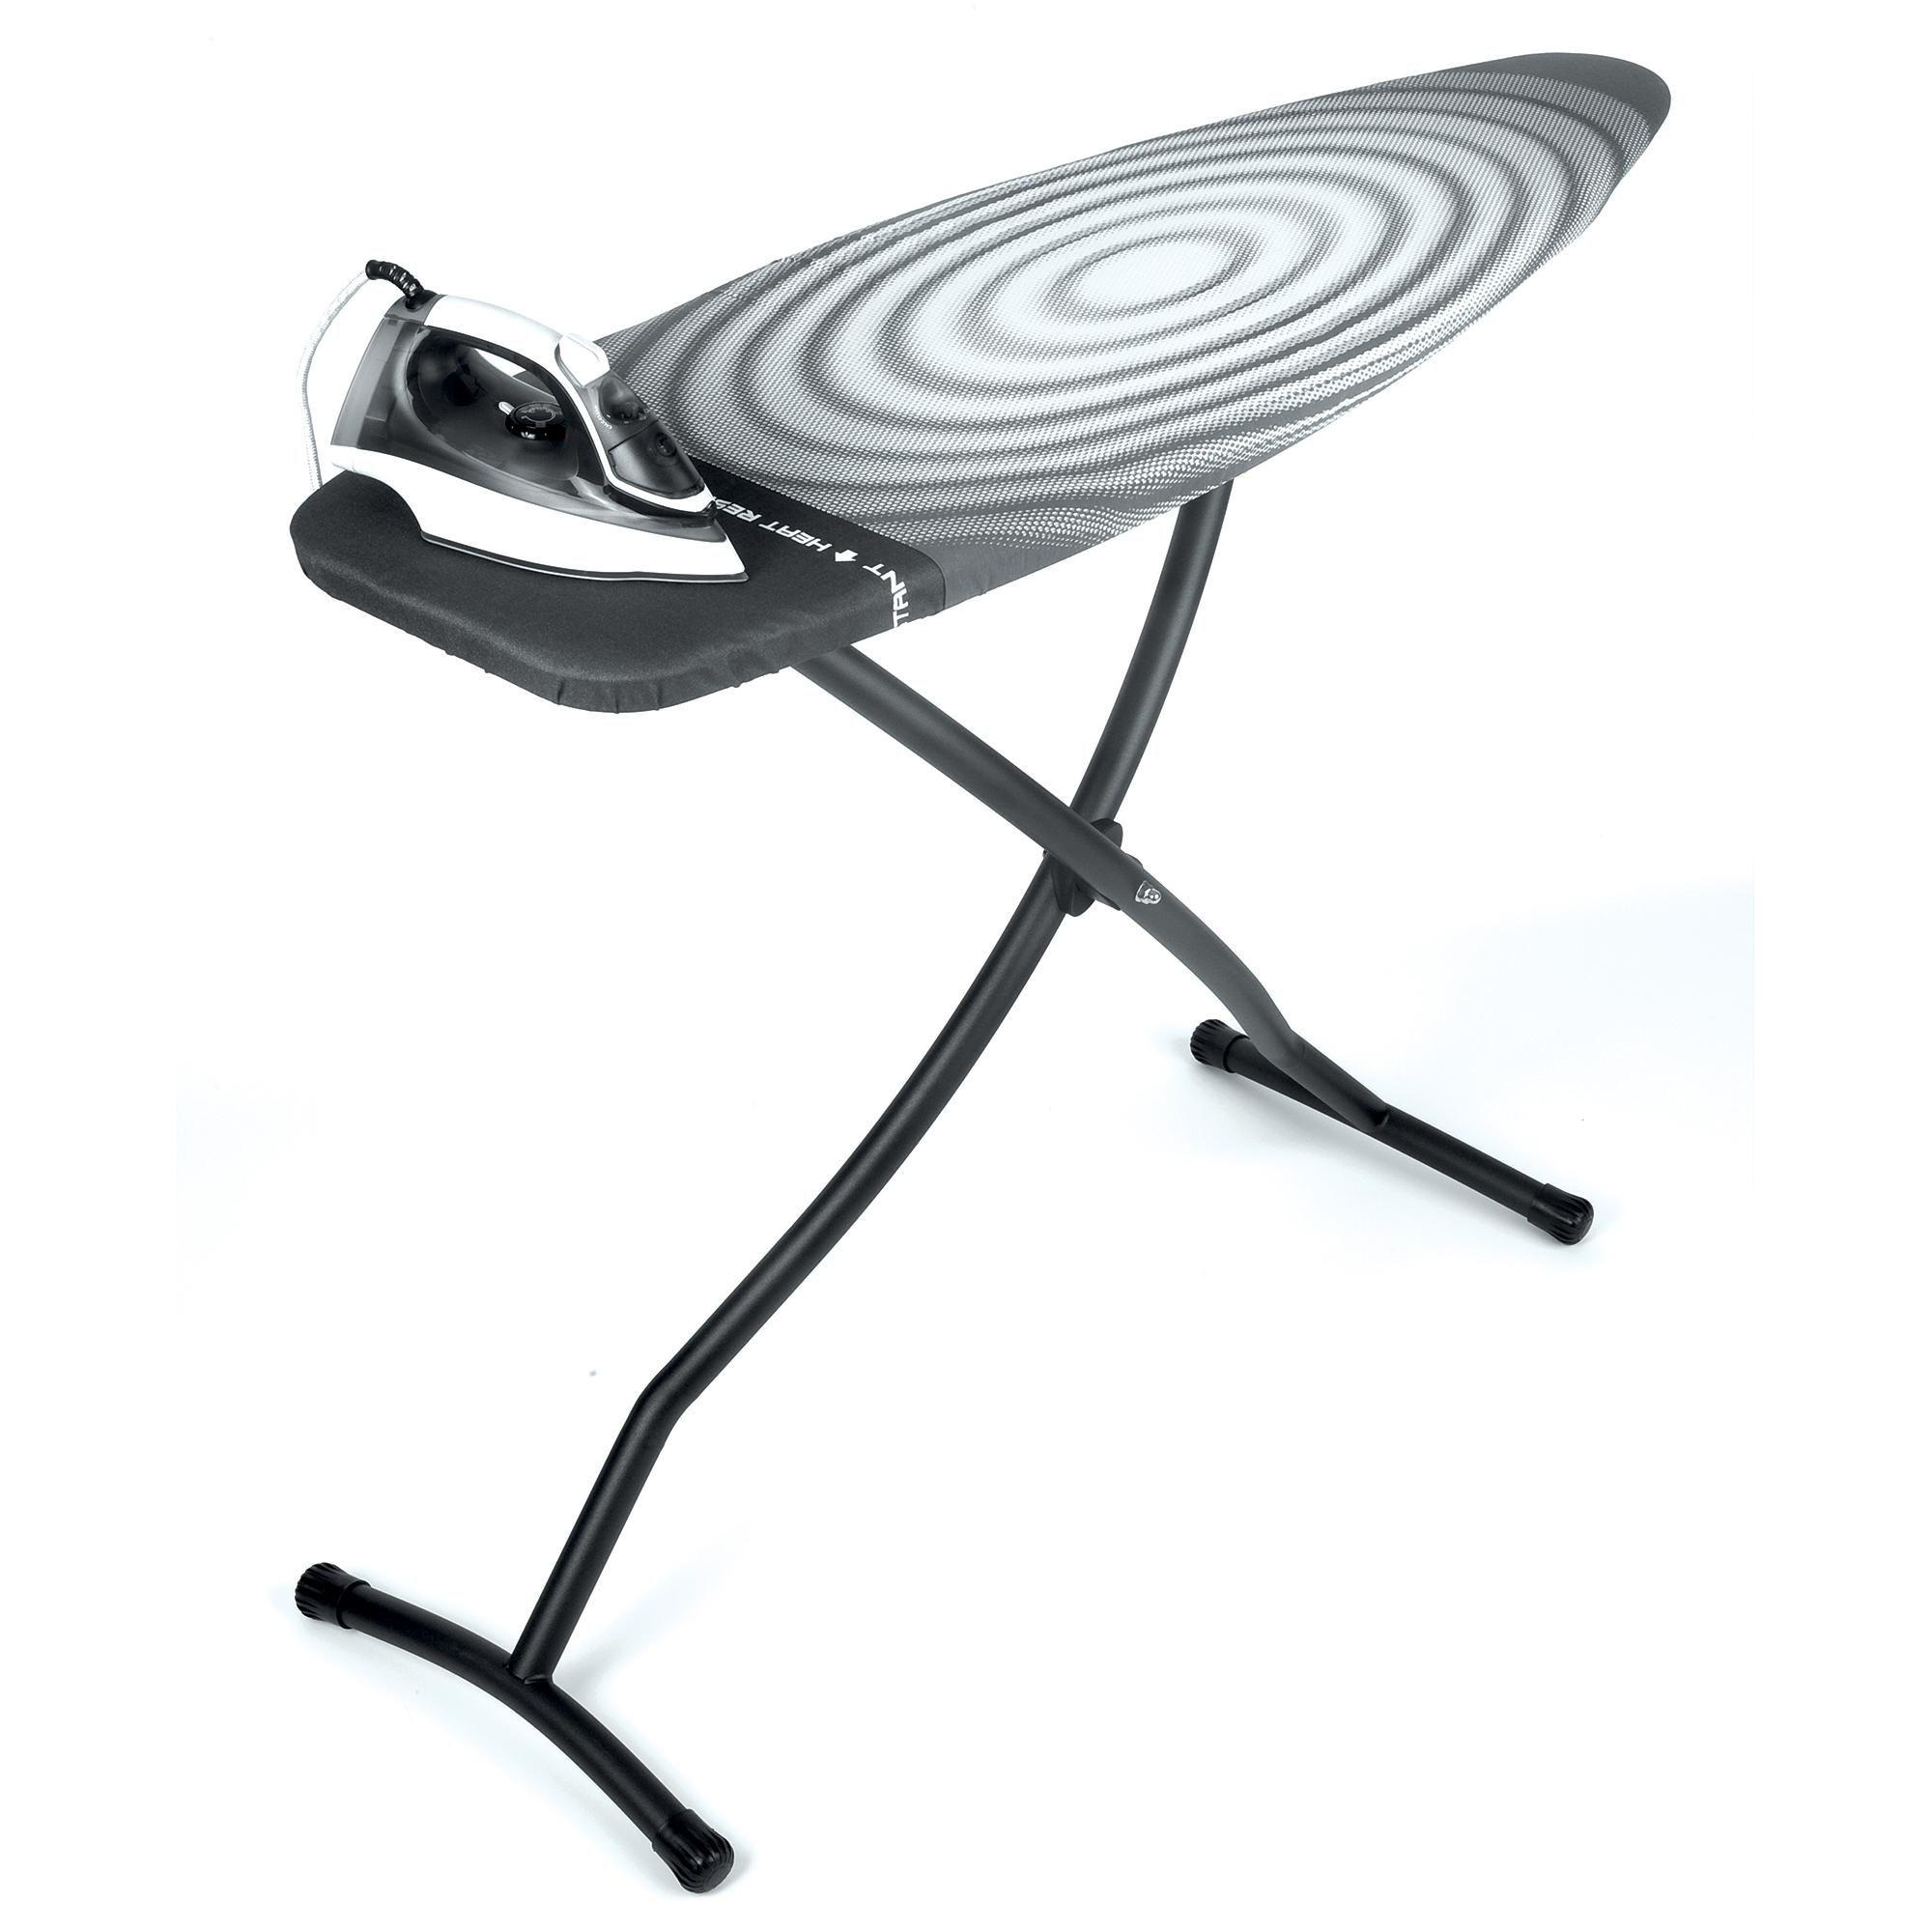 Brabantia Titan Oval Ironing Board In 2020 Tabletop Ironing